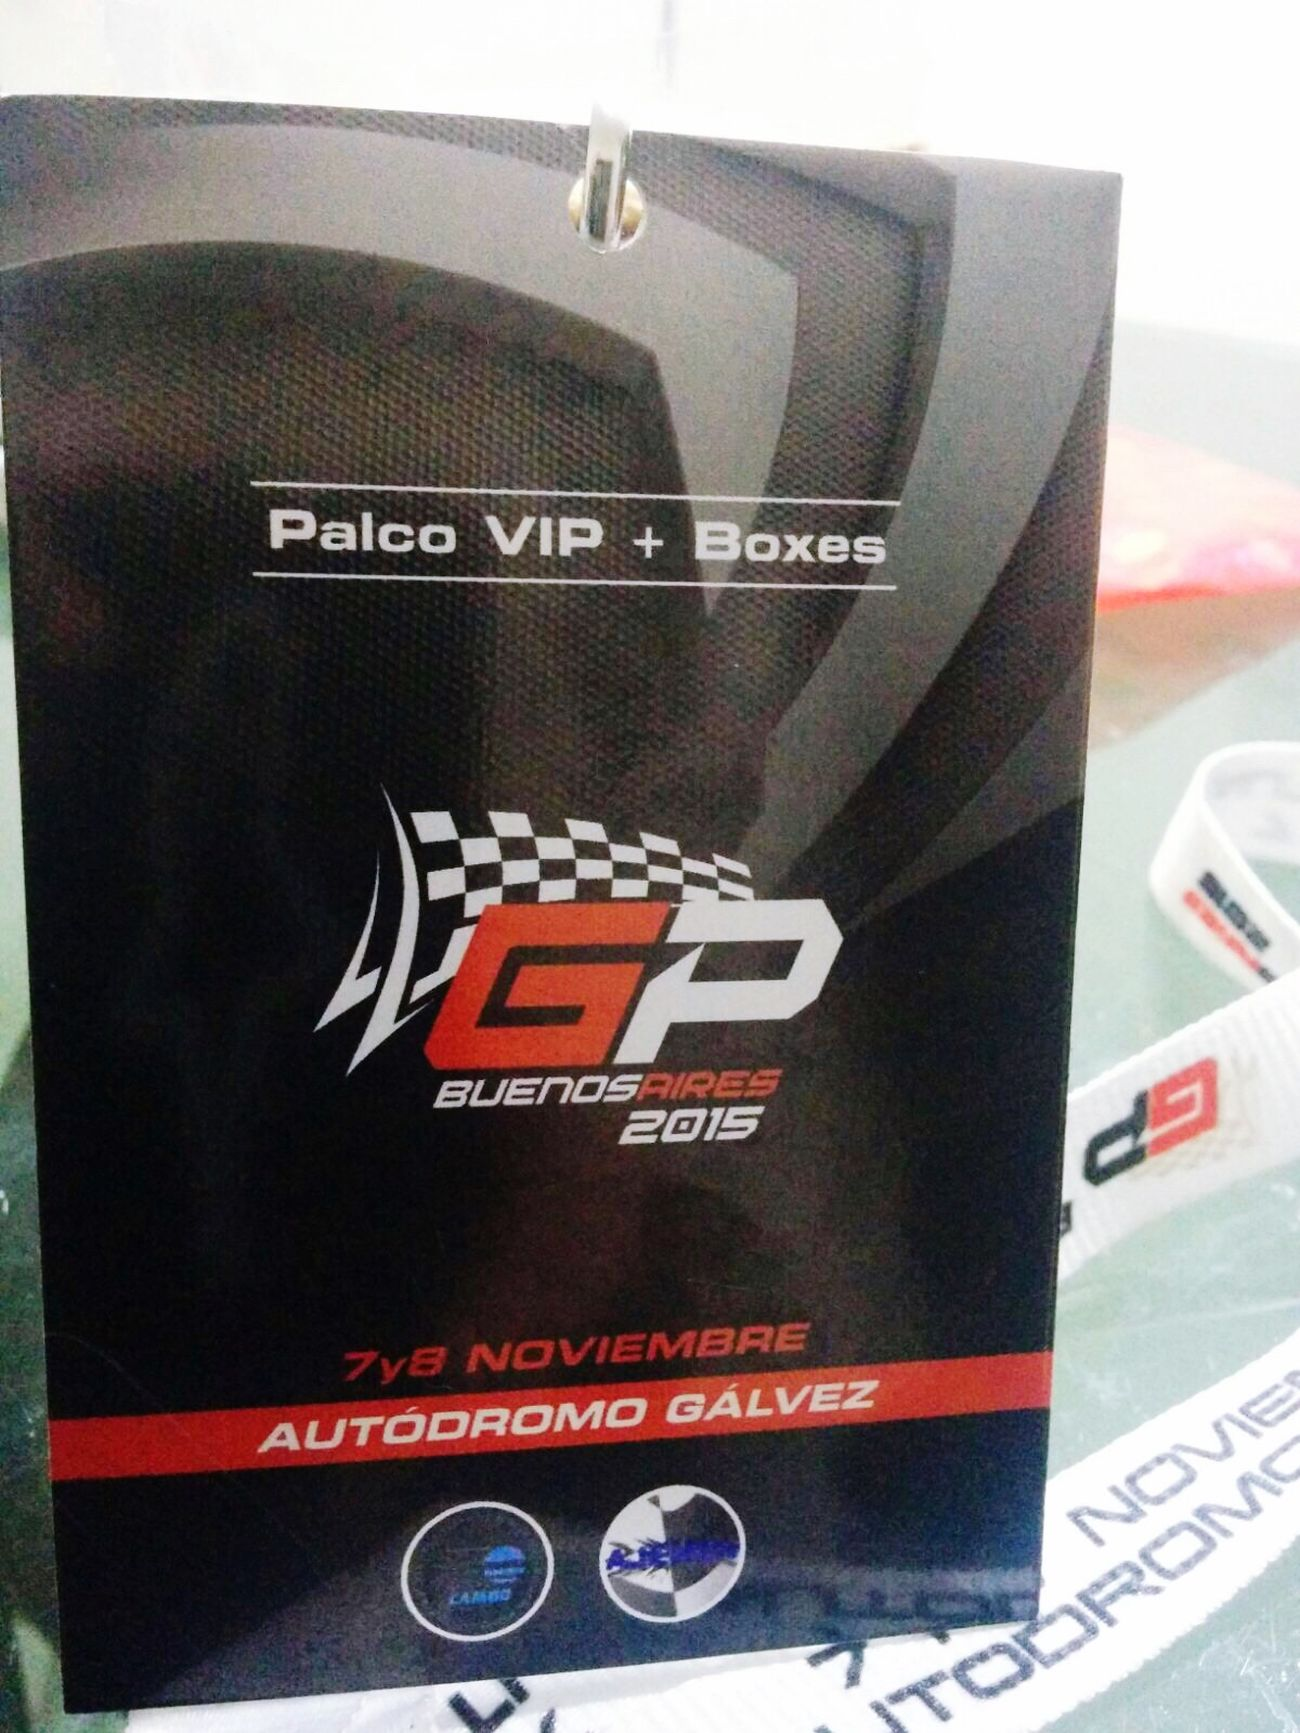 Motogp2015 Enjoying Life Buenosaires Surprise Gift MDL ❤️ Autodromo Galvez